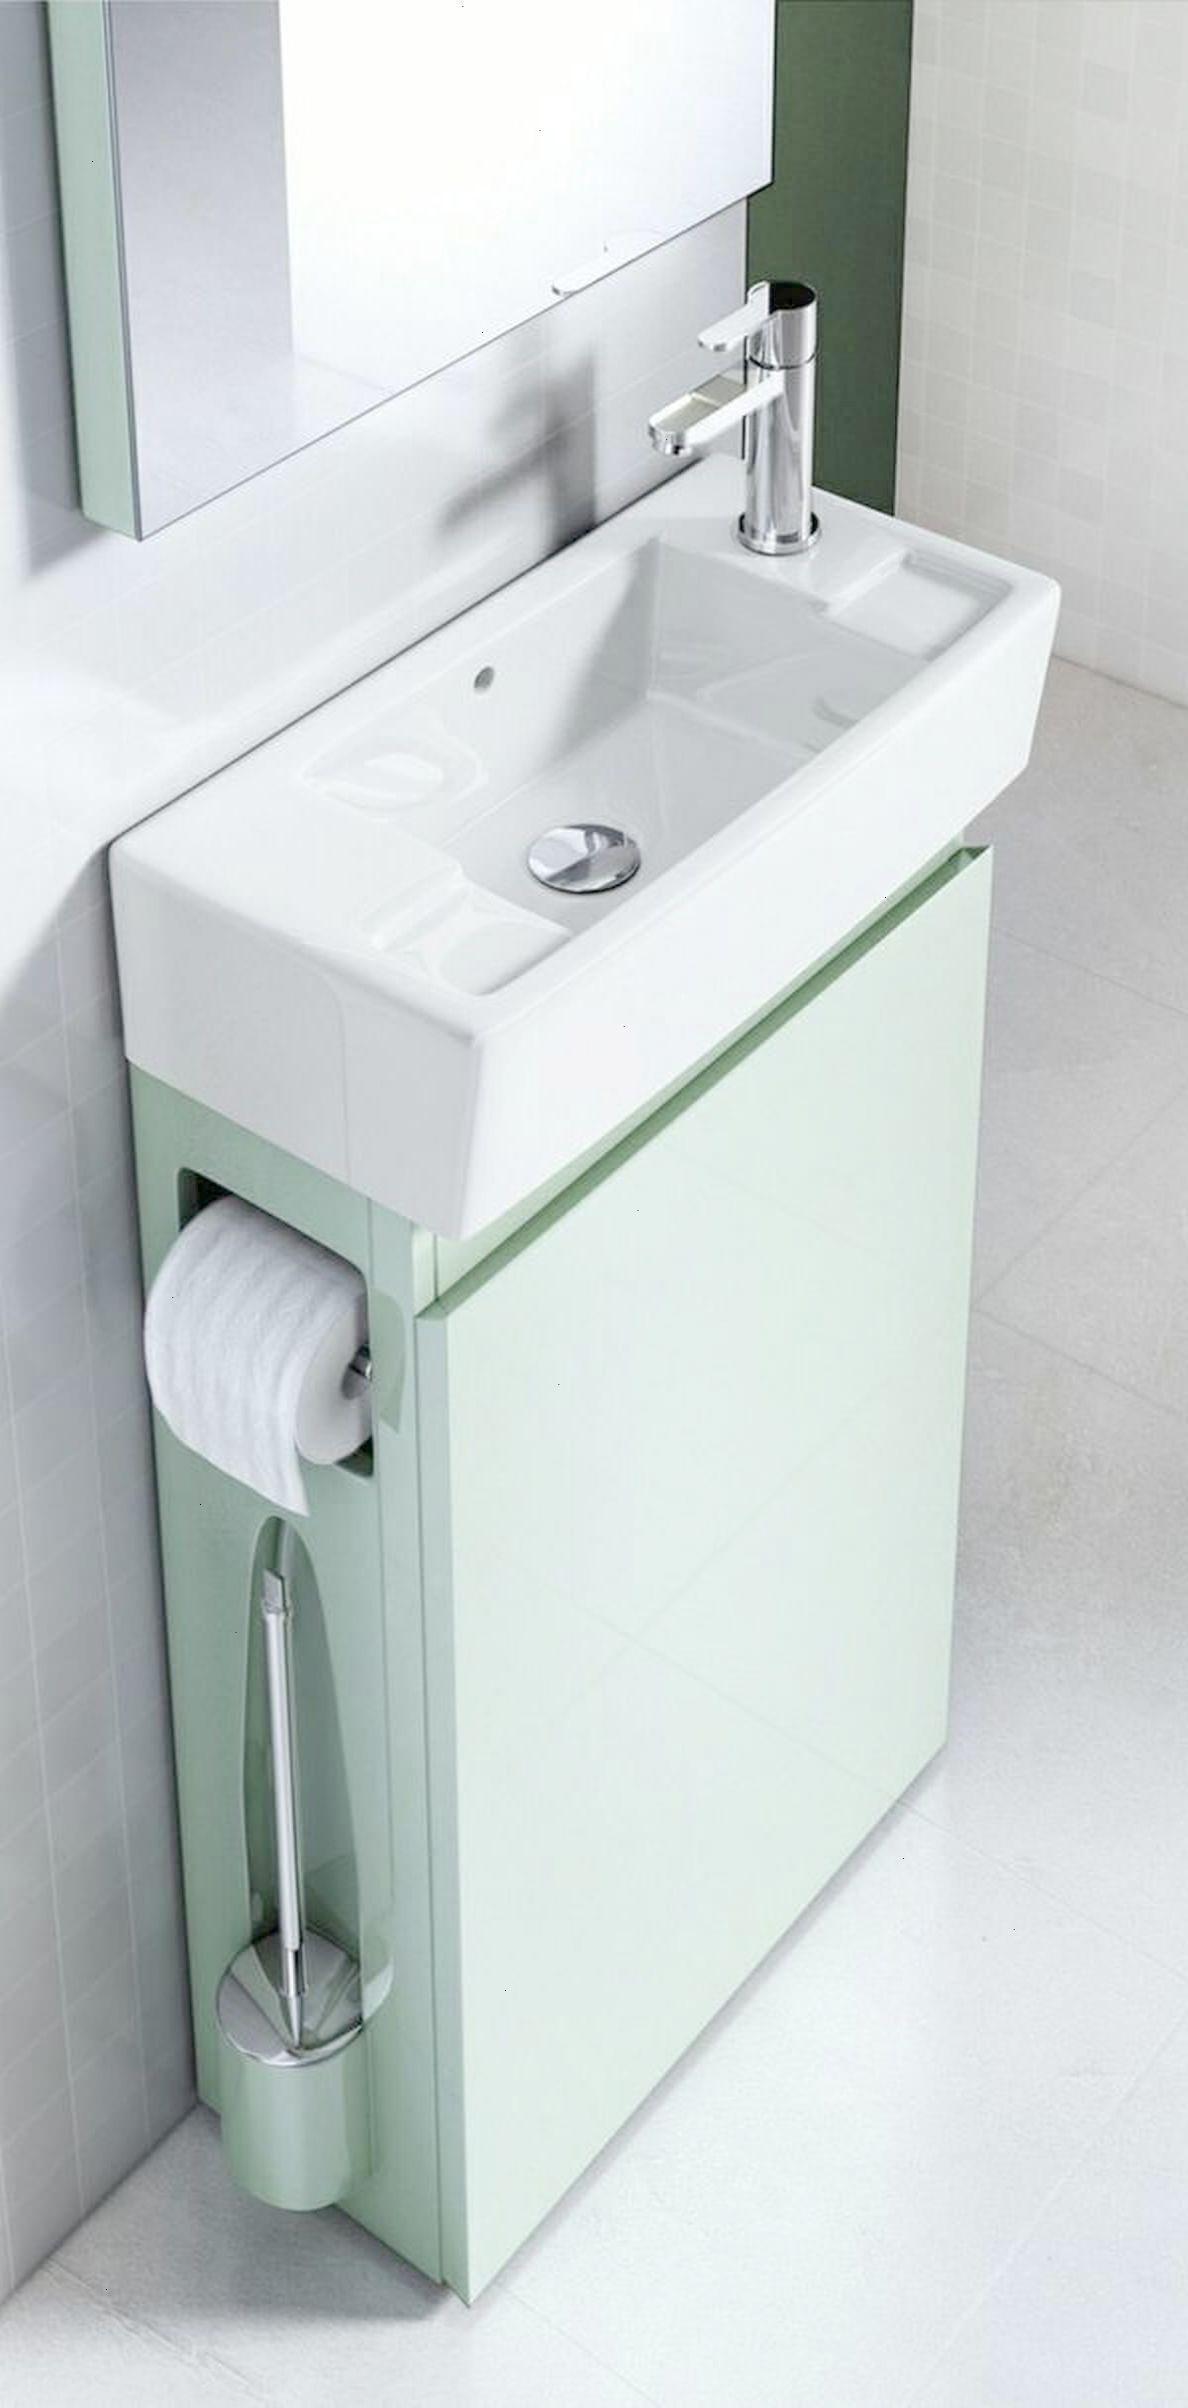 Bathroom Storage Ideas small bathroom cabinets storage unit ...